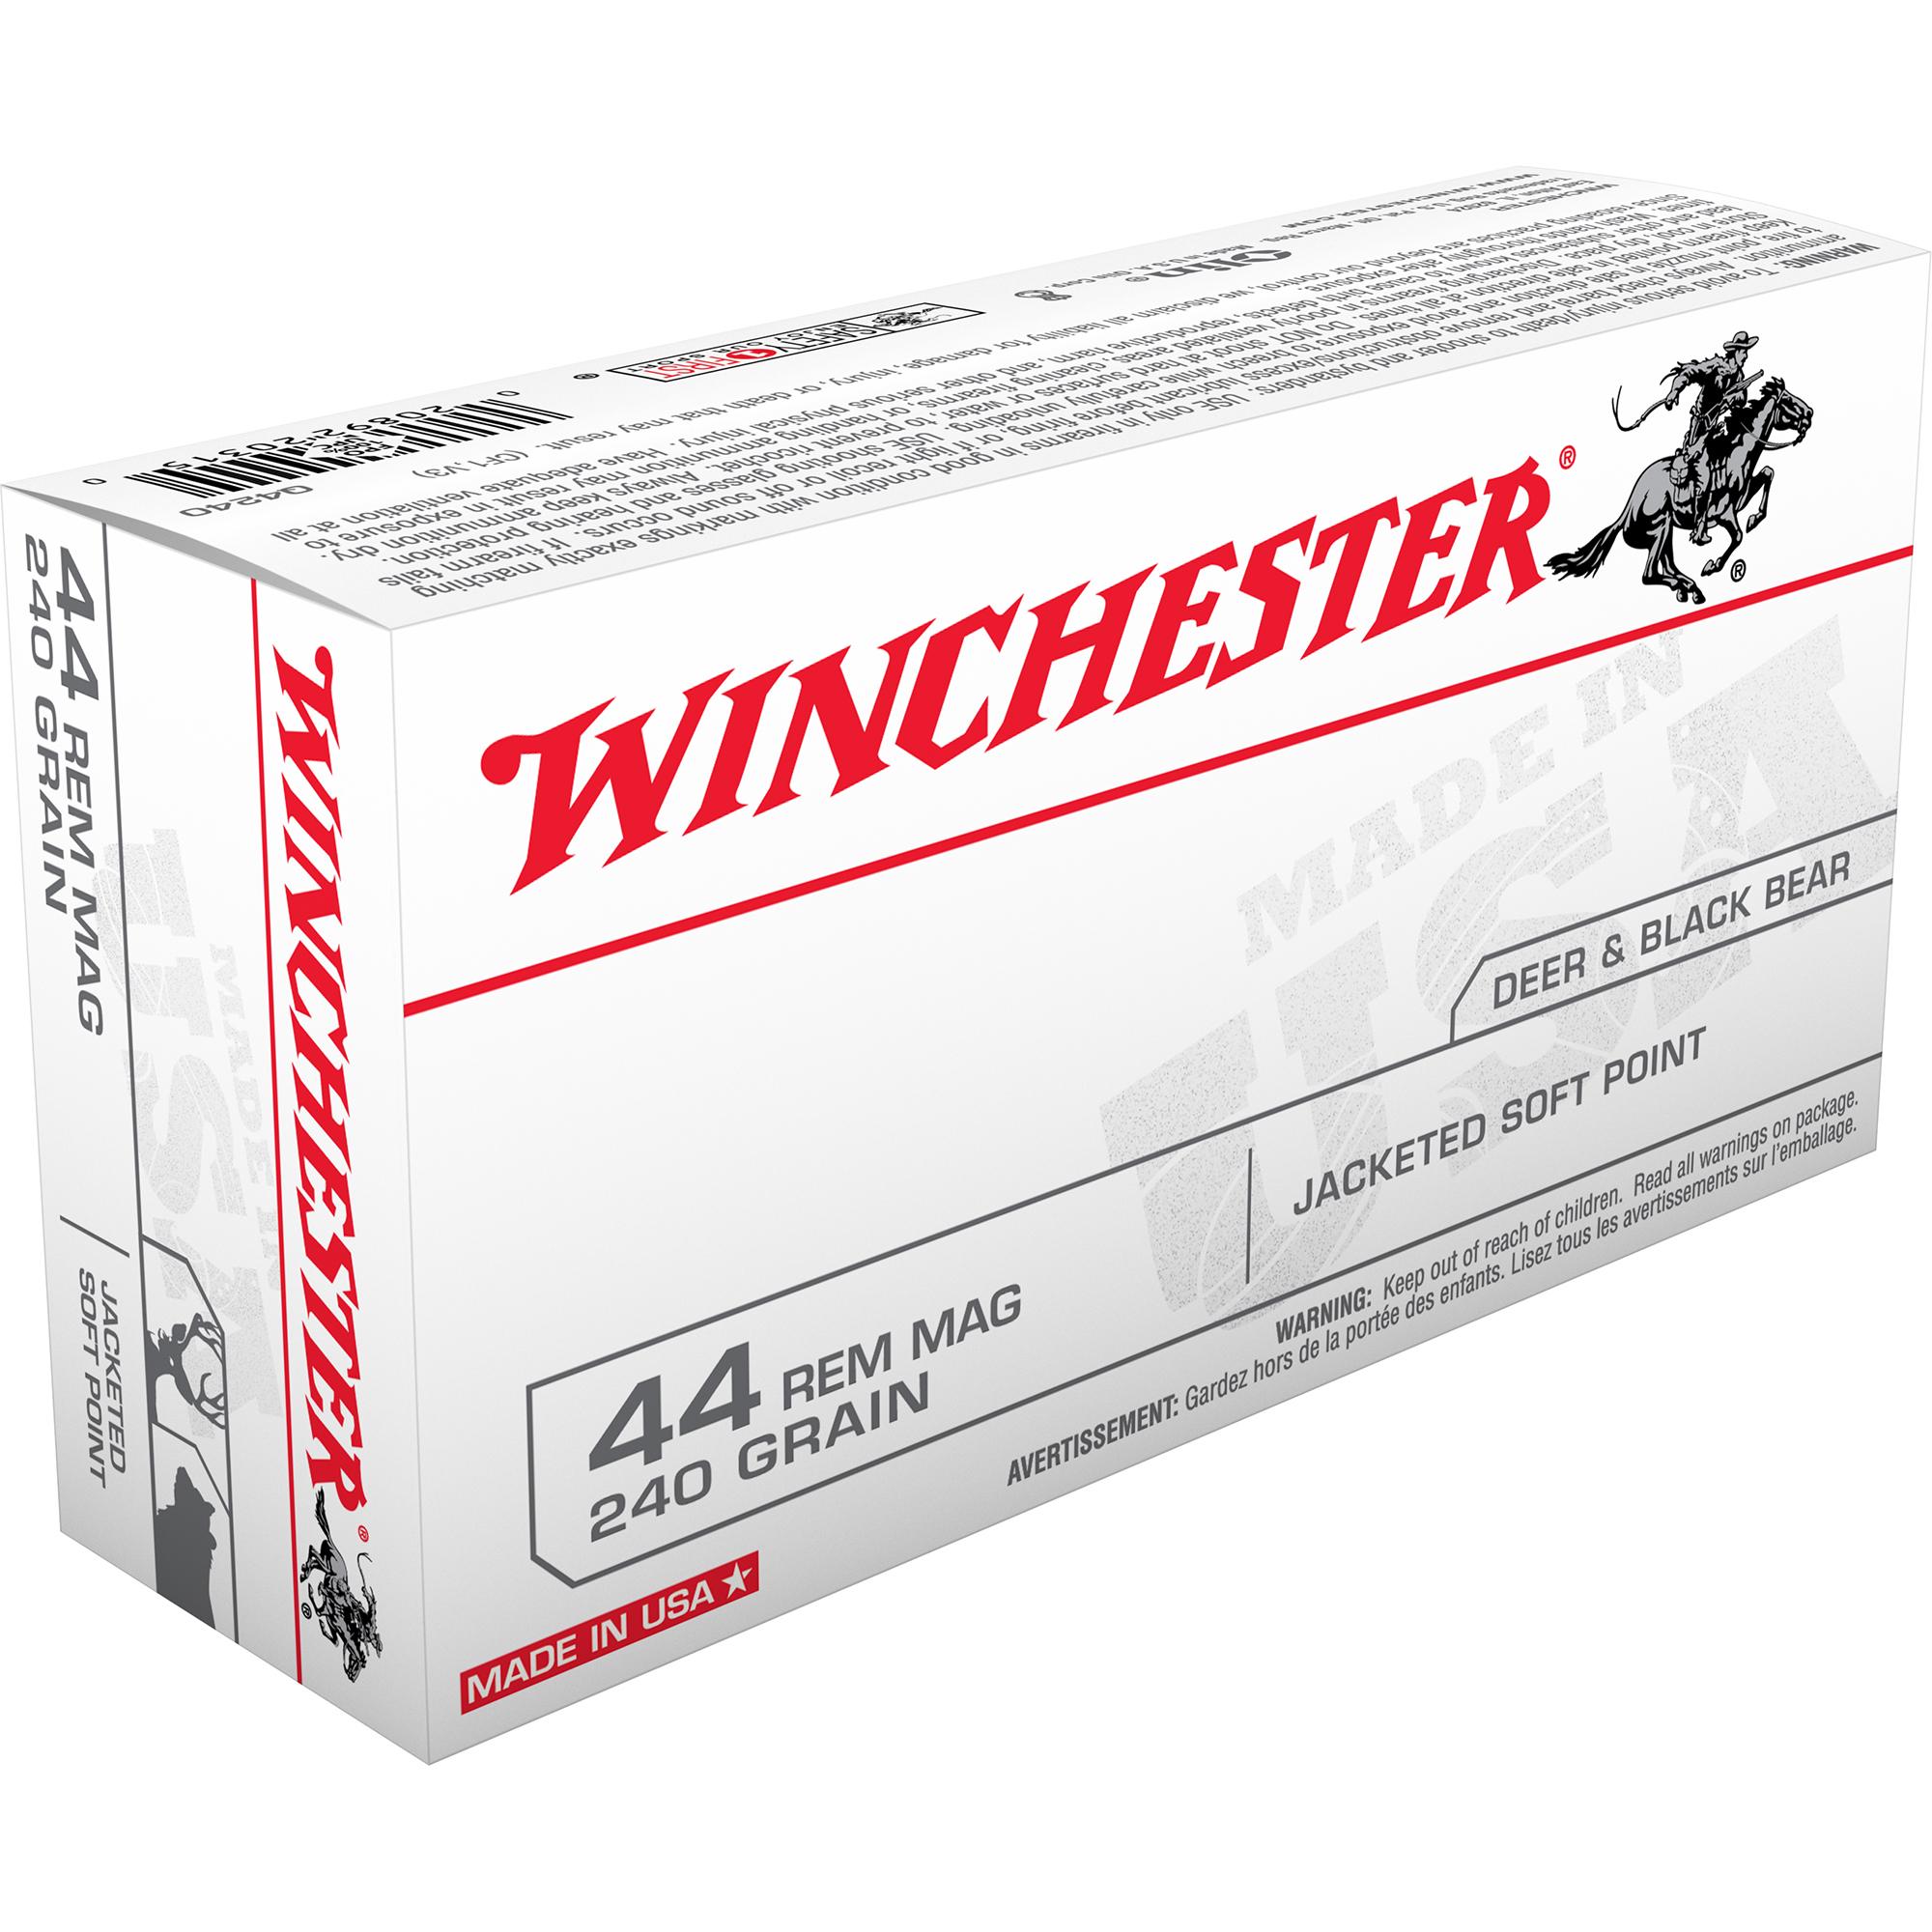 Winchester USA Handgun Ammo, .44 Rem Mag, 240-gr., JSP